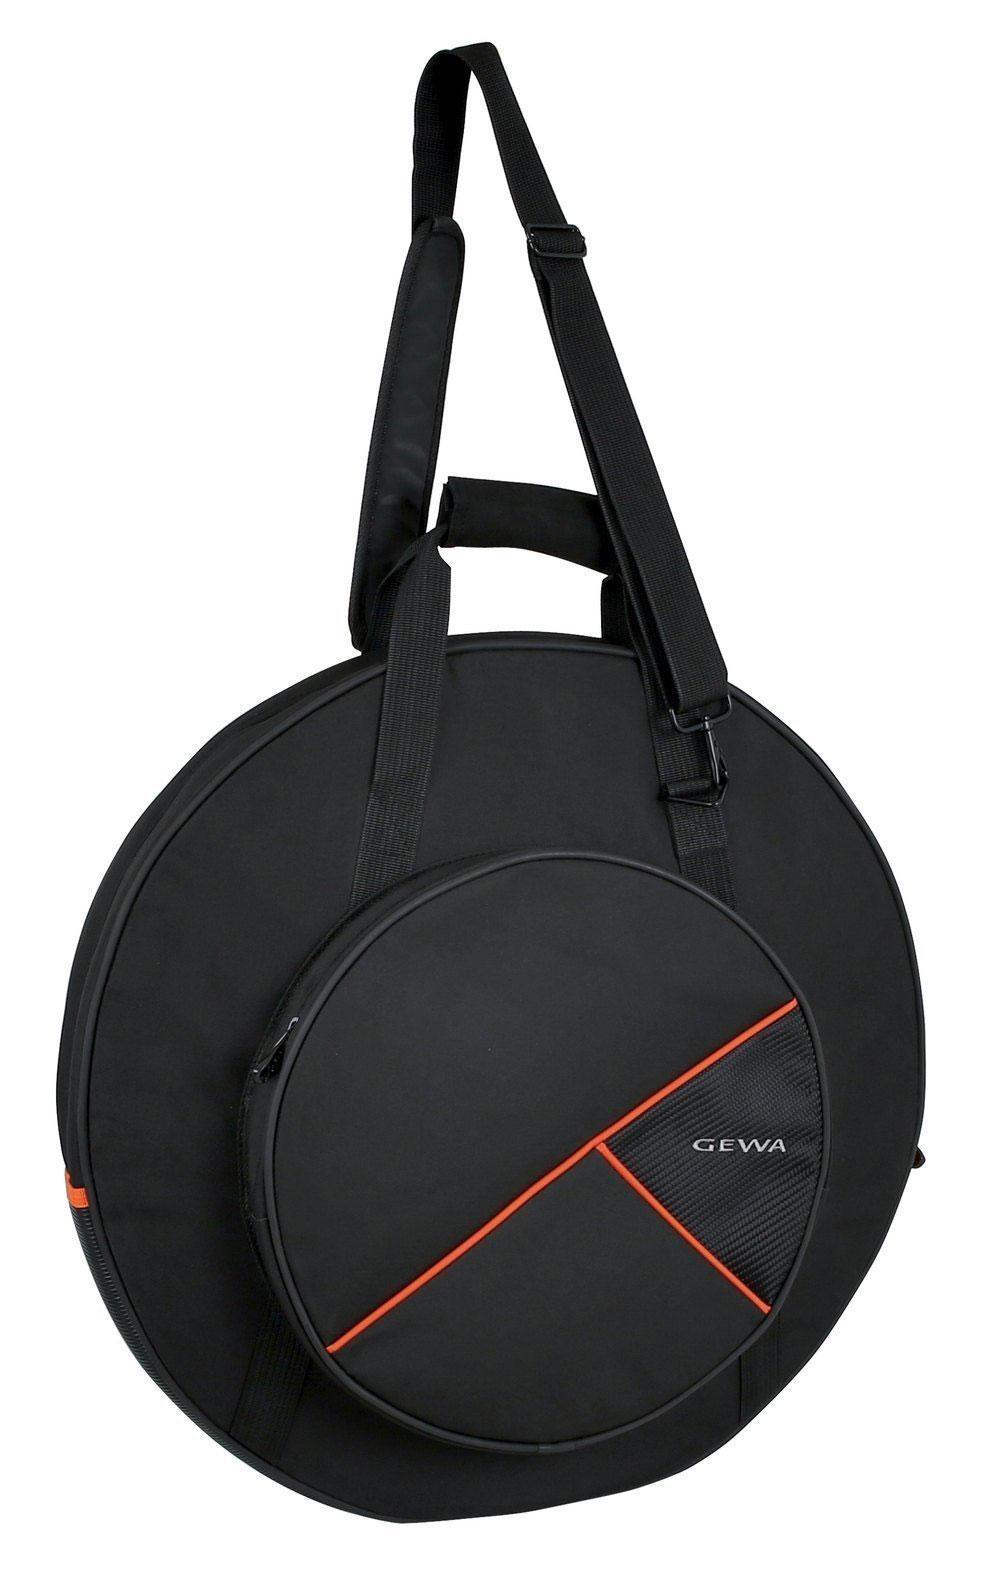 Gewa Beckentasche Premium 22'